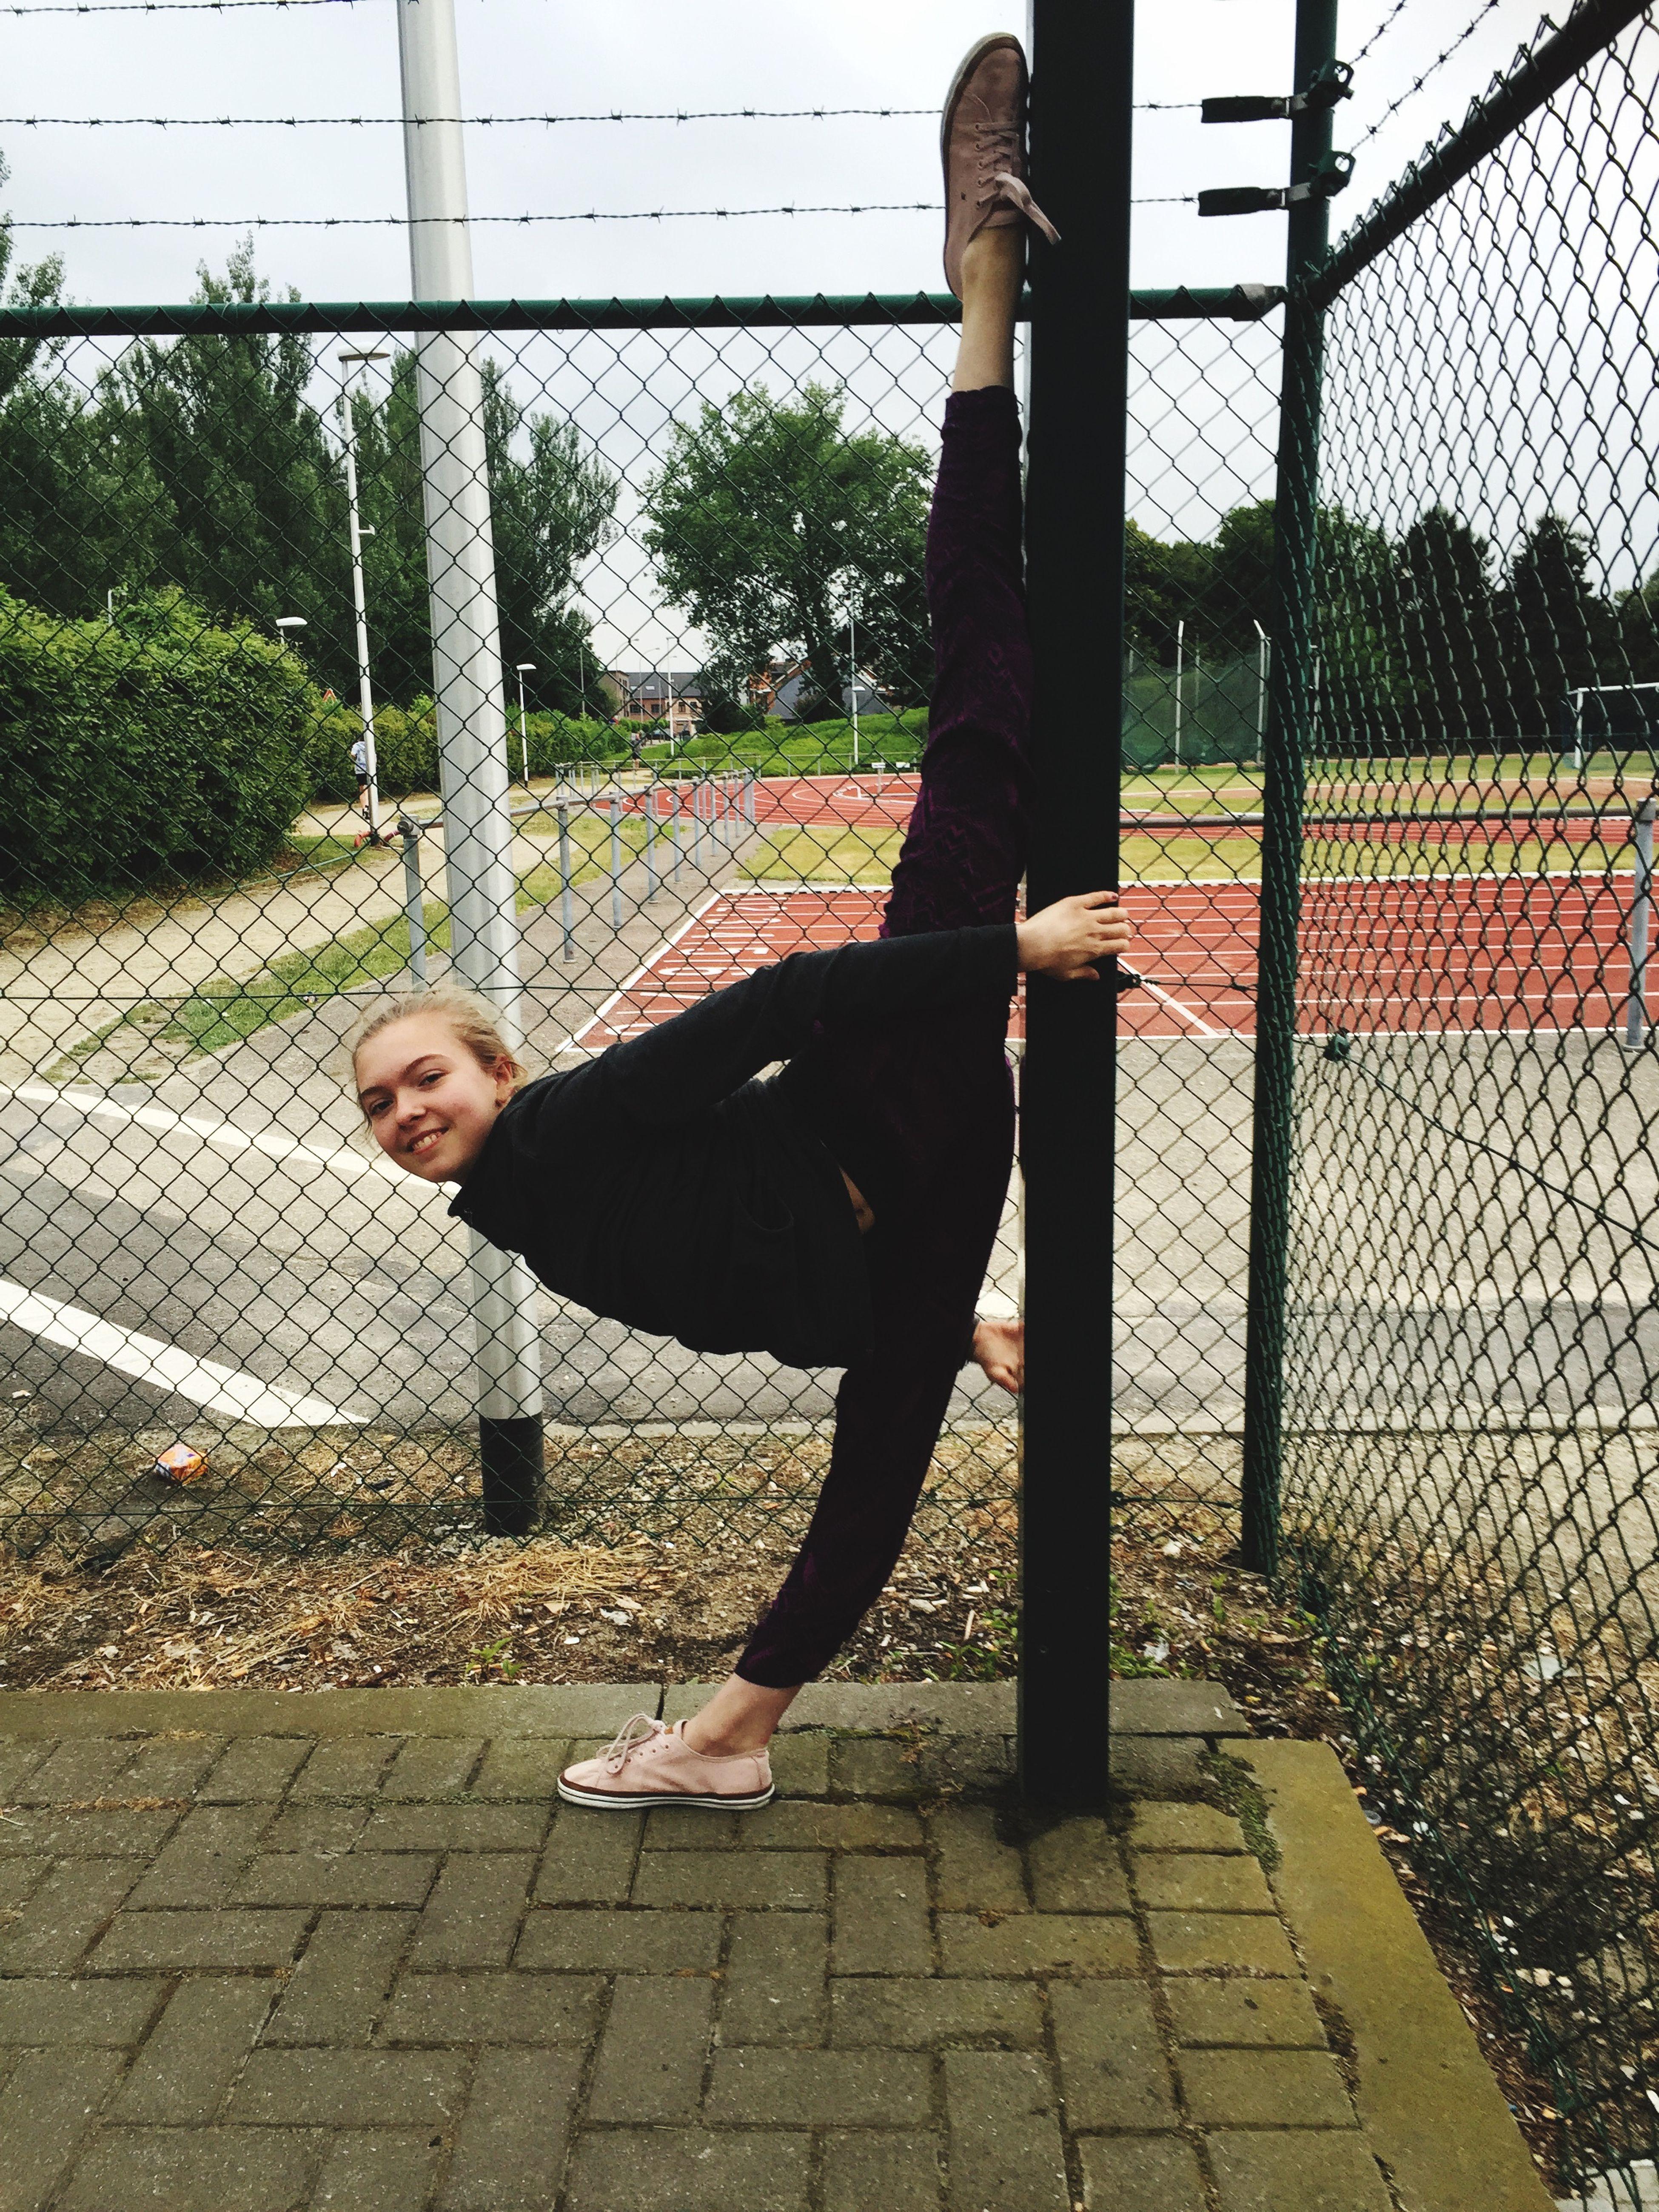 I ❤️ Rythmic gymnastics